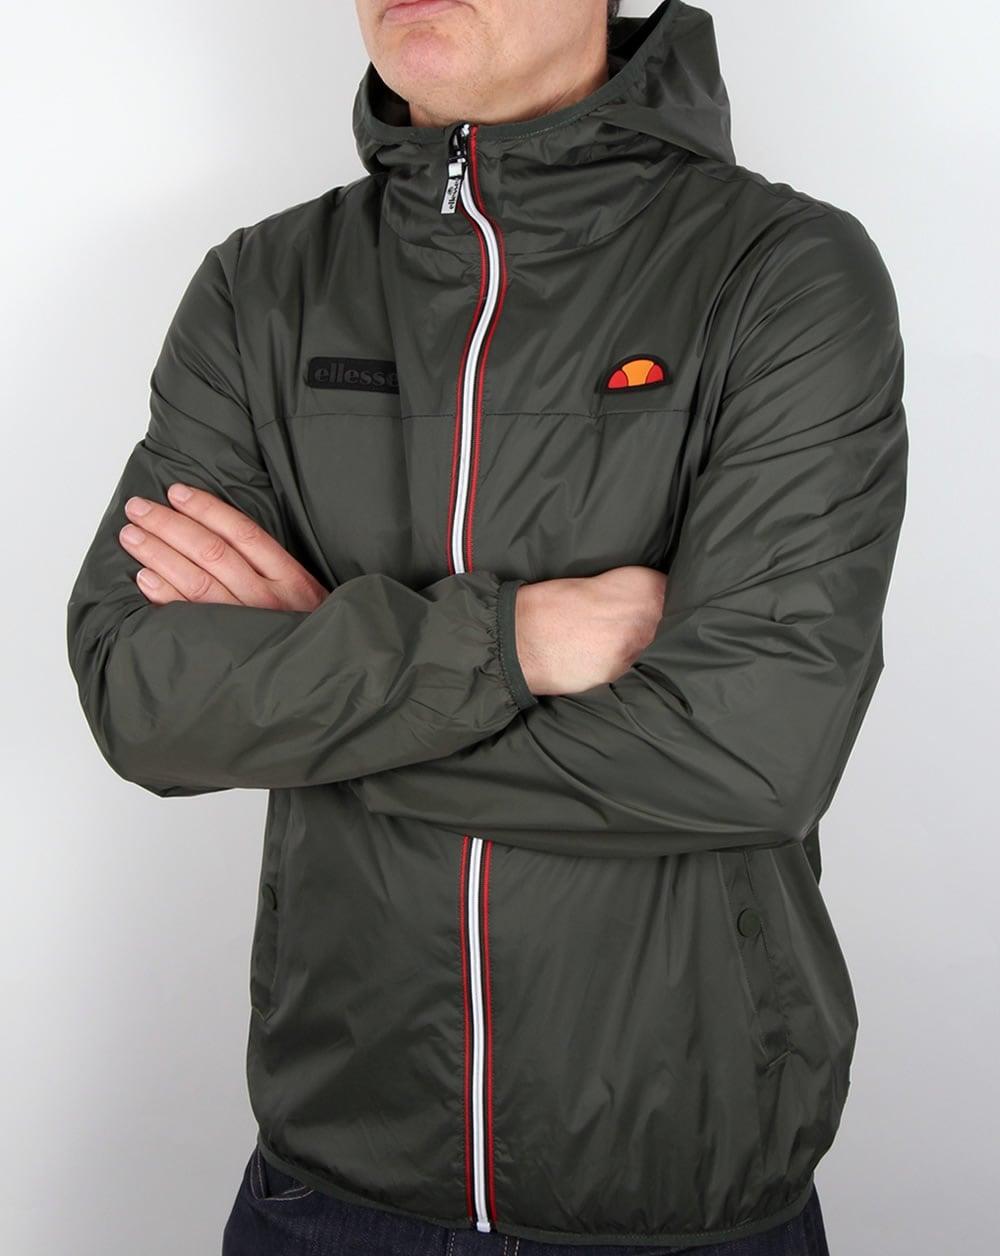 ellesse sirente jacket green khaki hooded raincoat parka. Black Bedroom Furniture Sets. Home Design Ideas